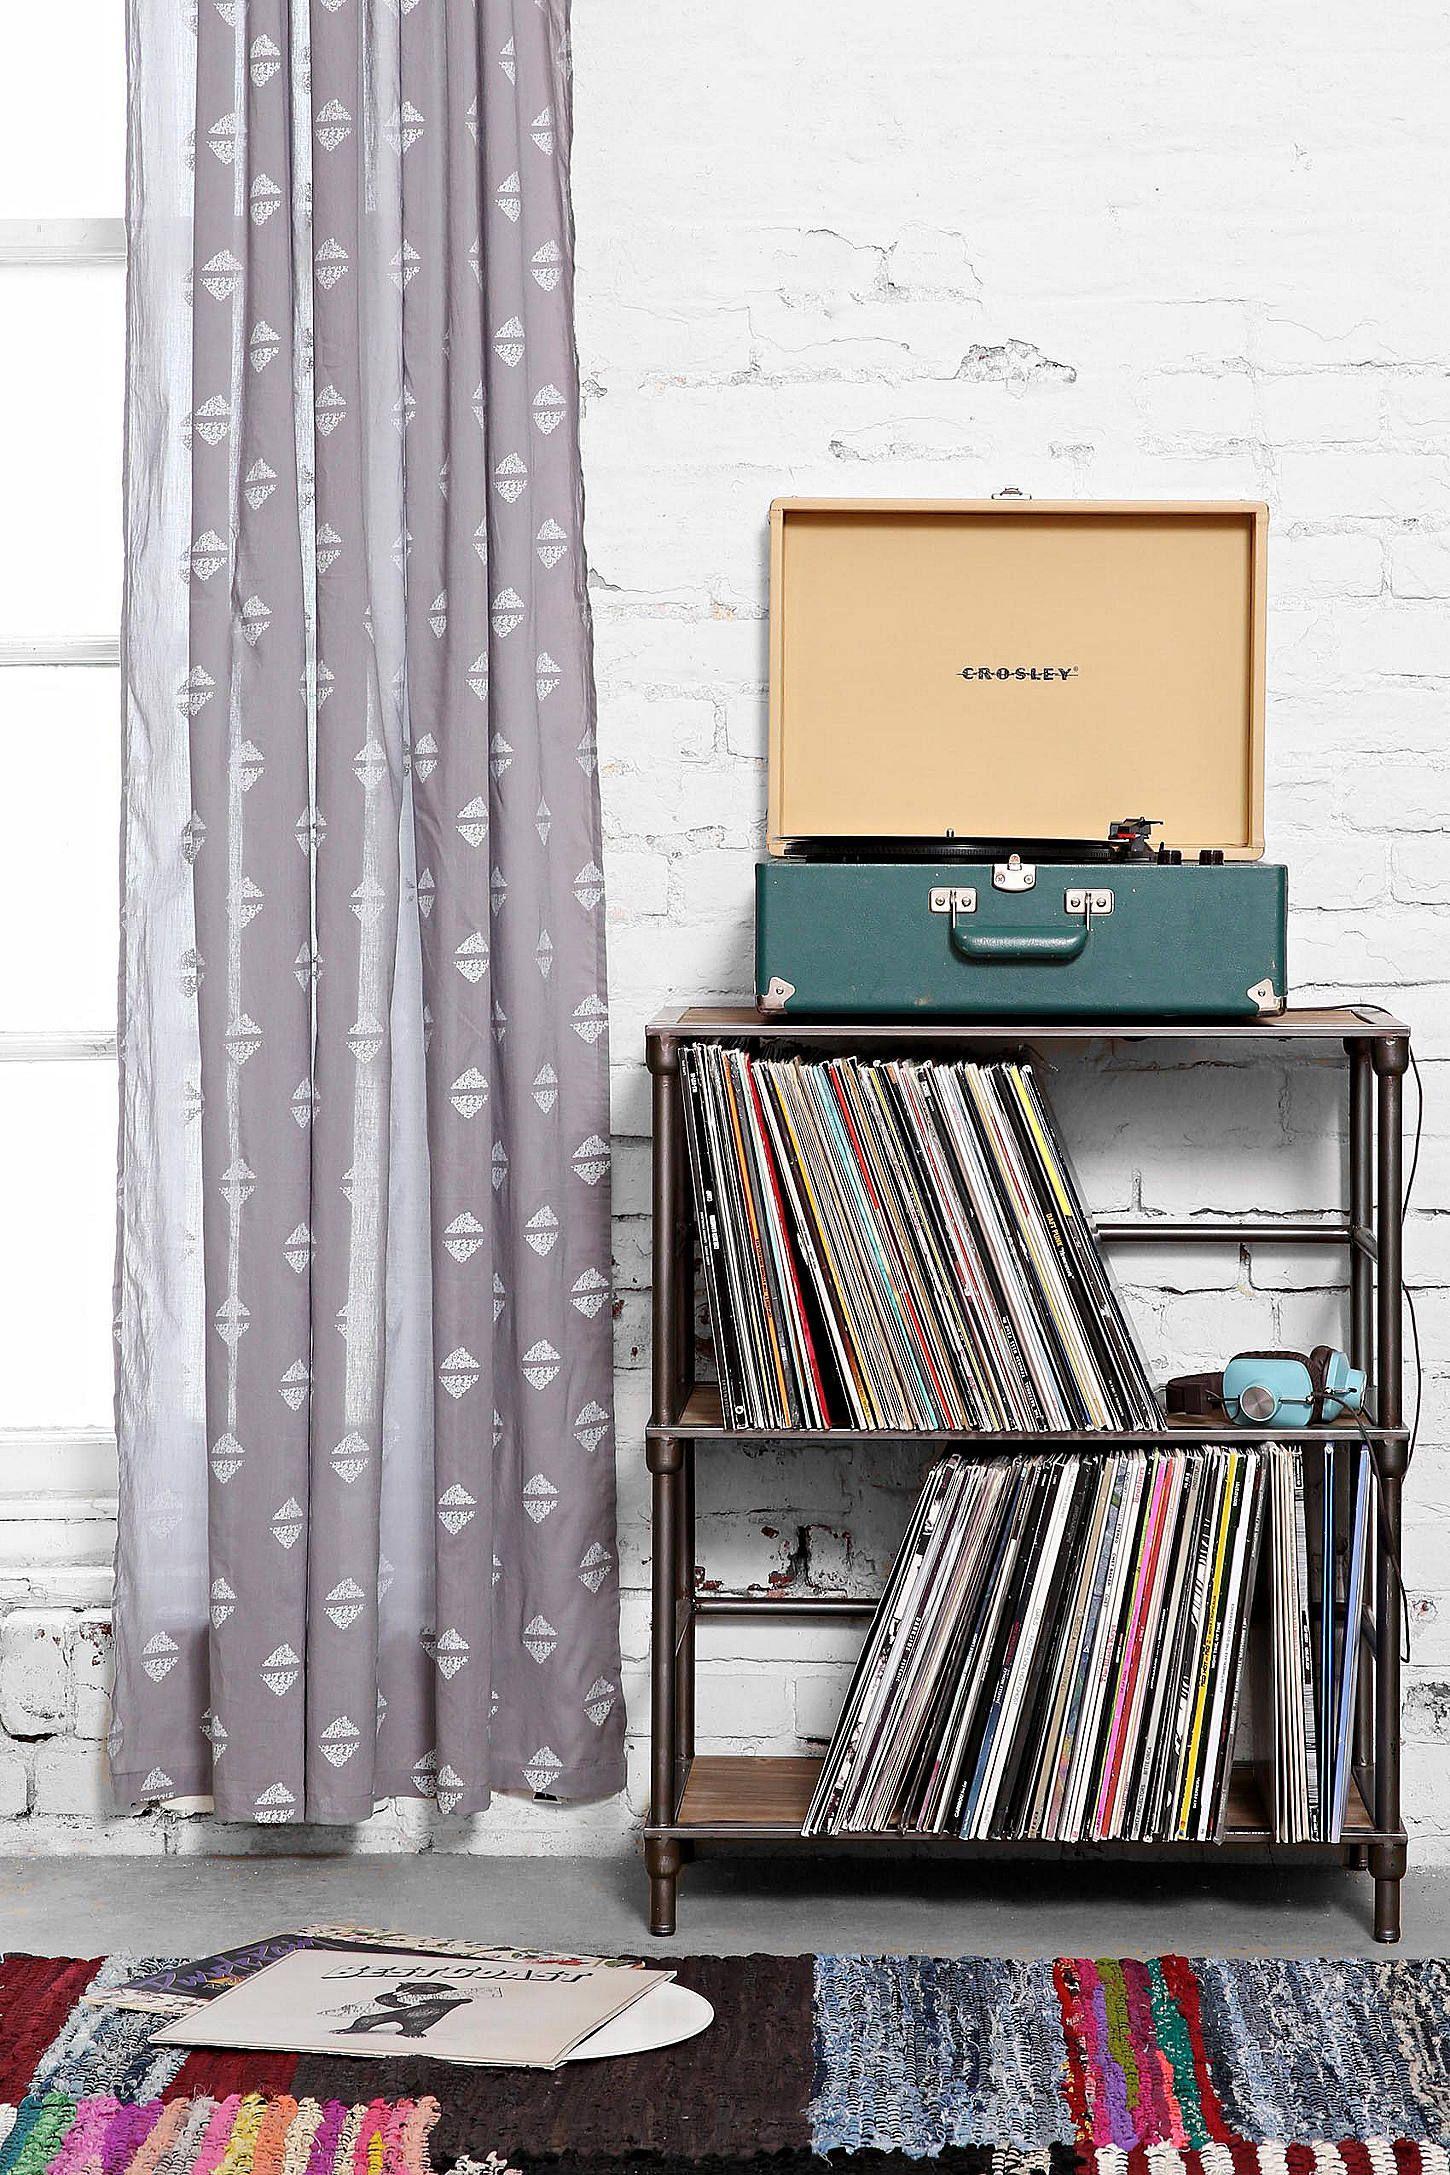 Industrial Vinyl Storage Shelf Vinyl storage, Storage